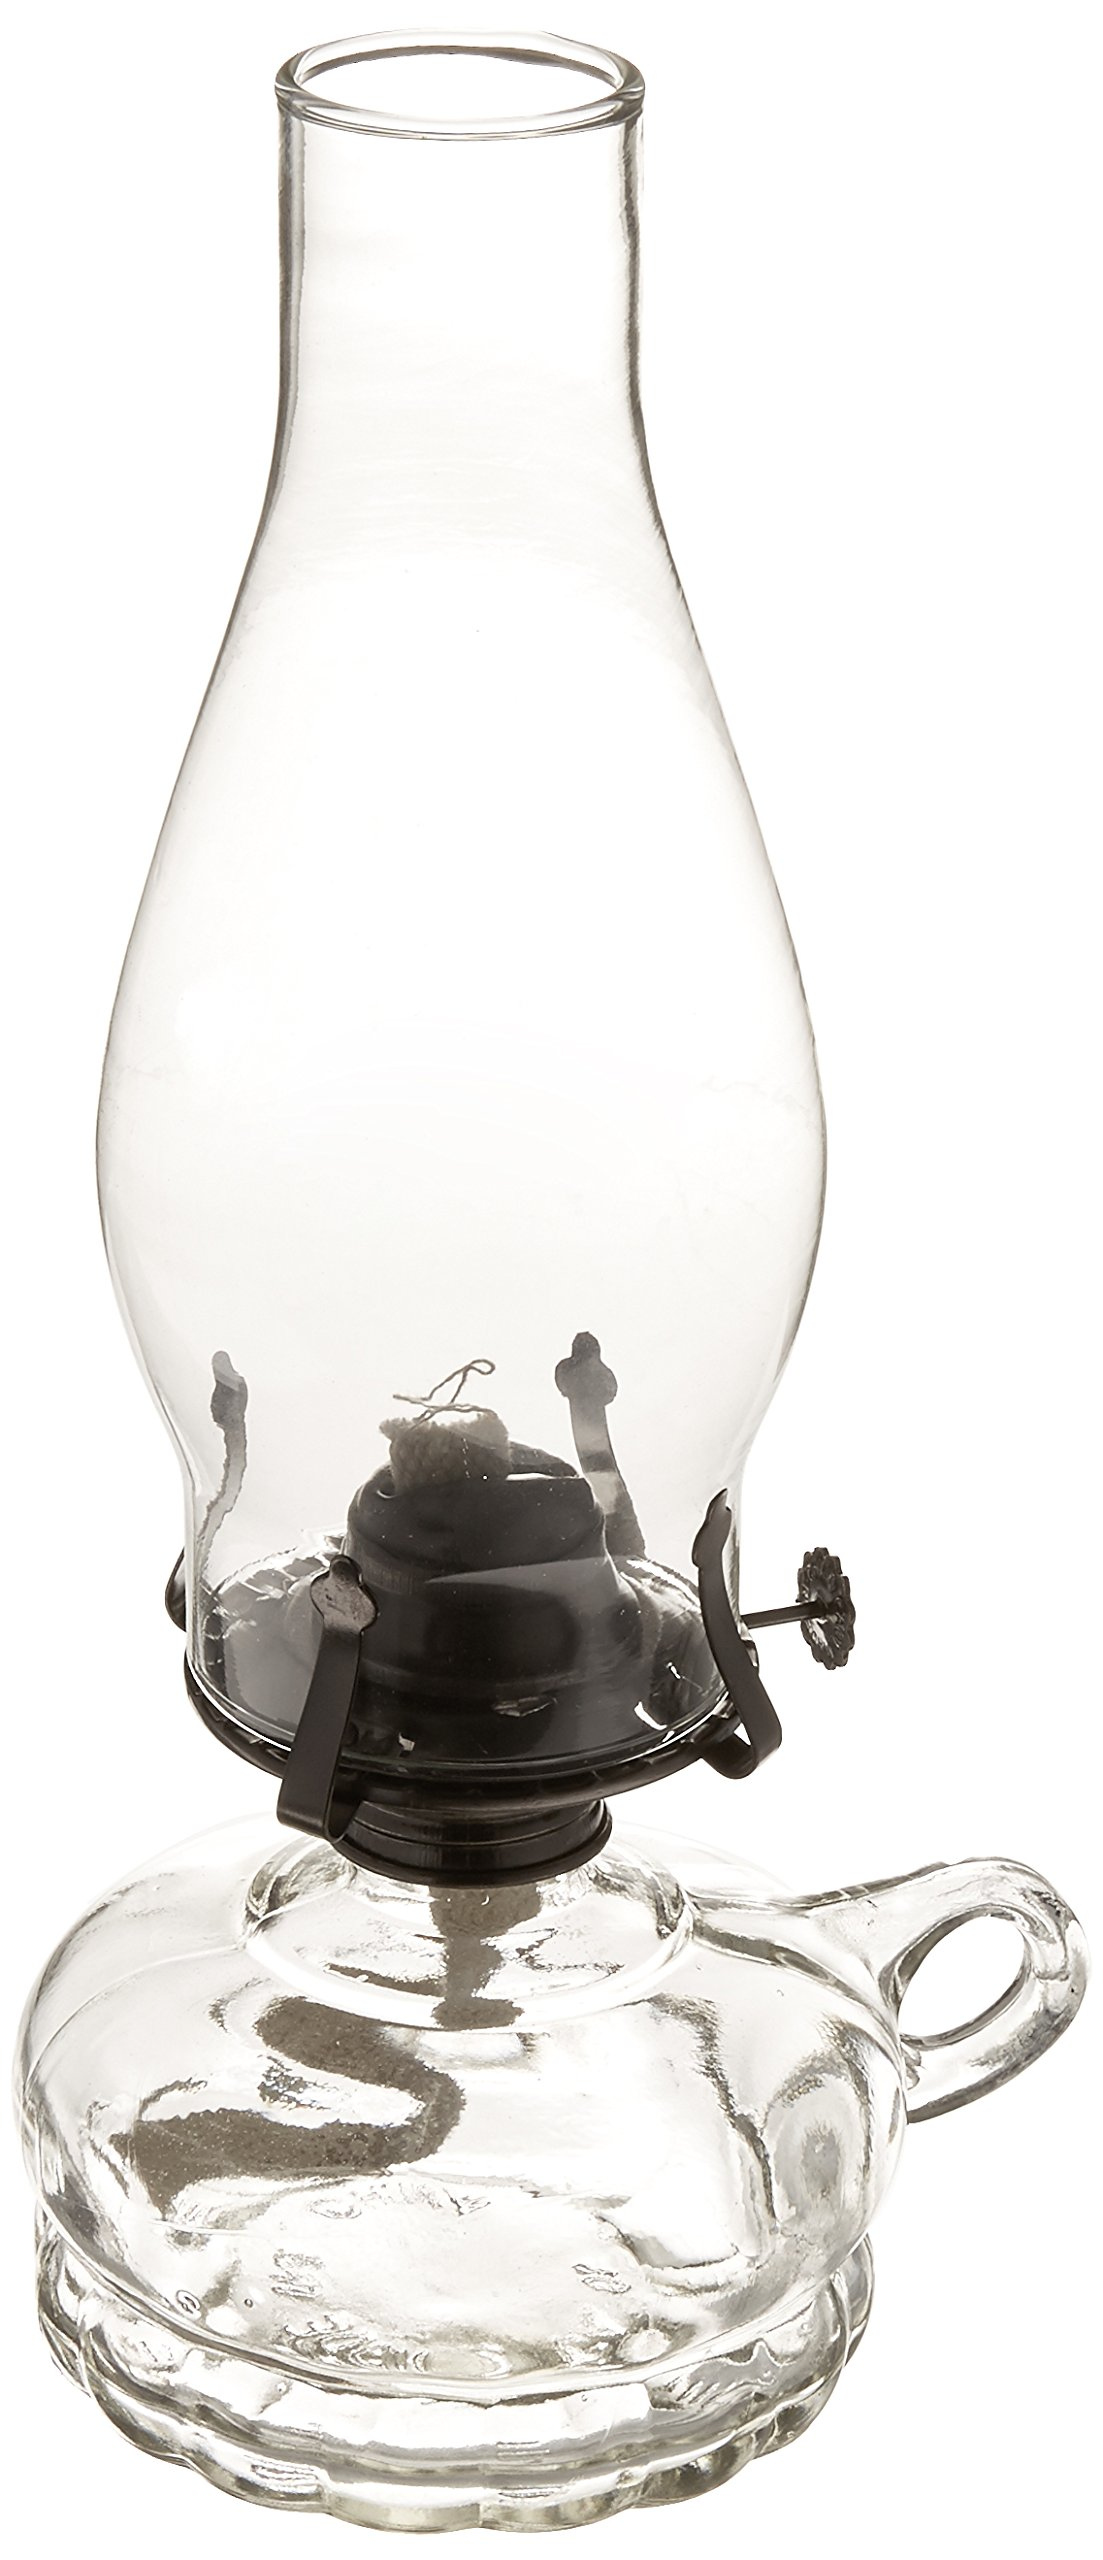 Lamplight Farms 110 Chamber Oil Lamp by Lamplight Farms